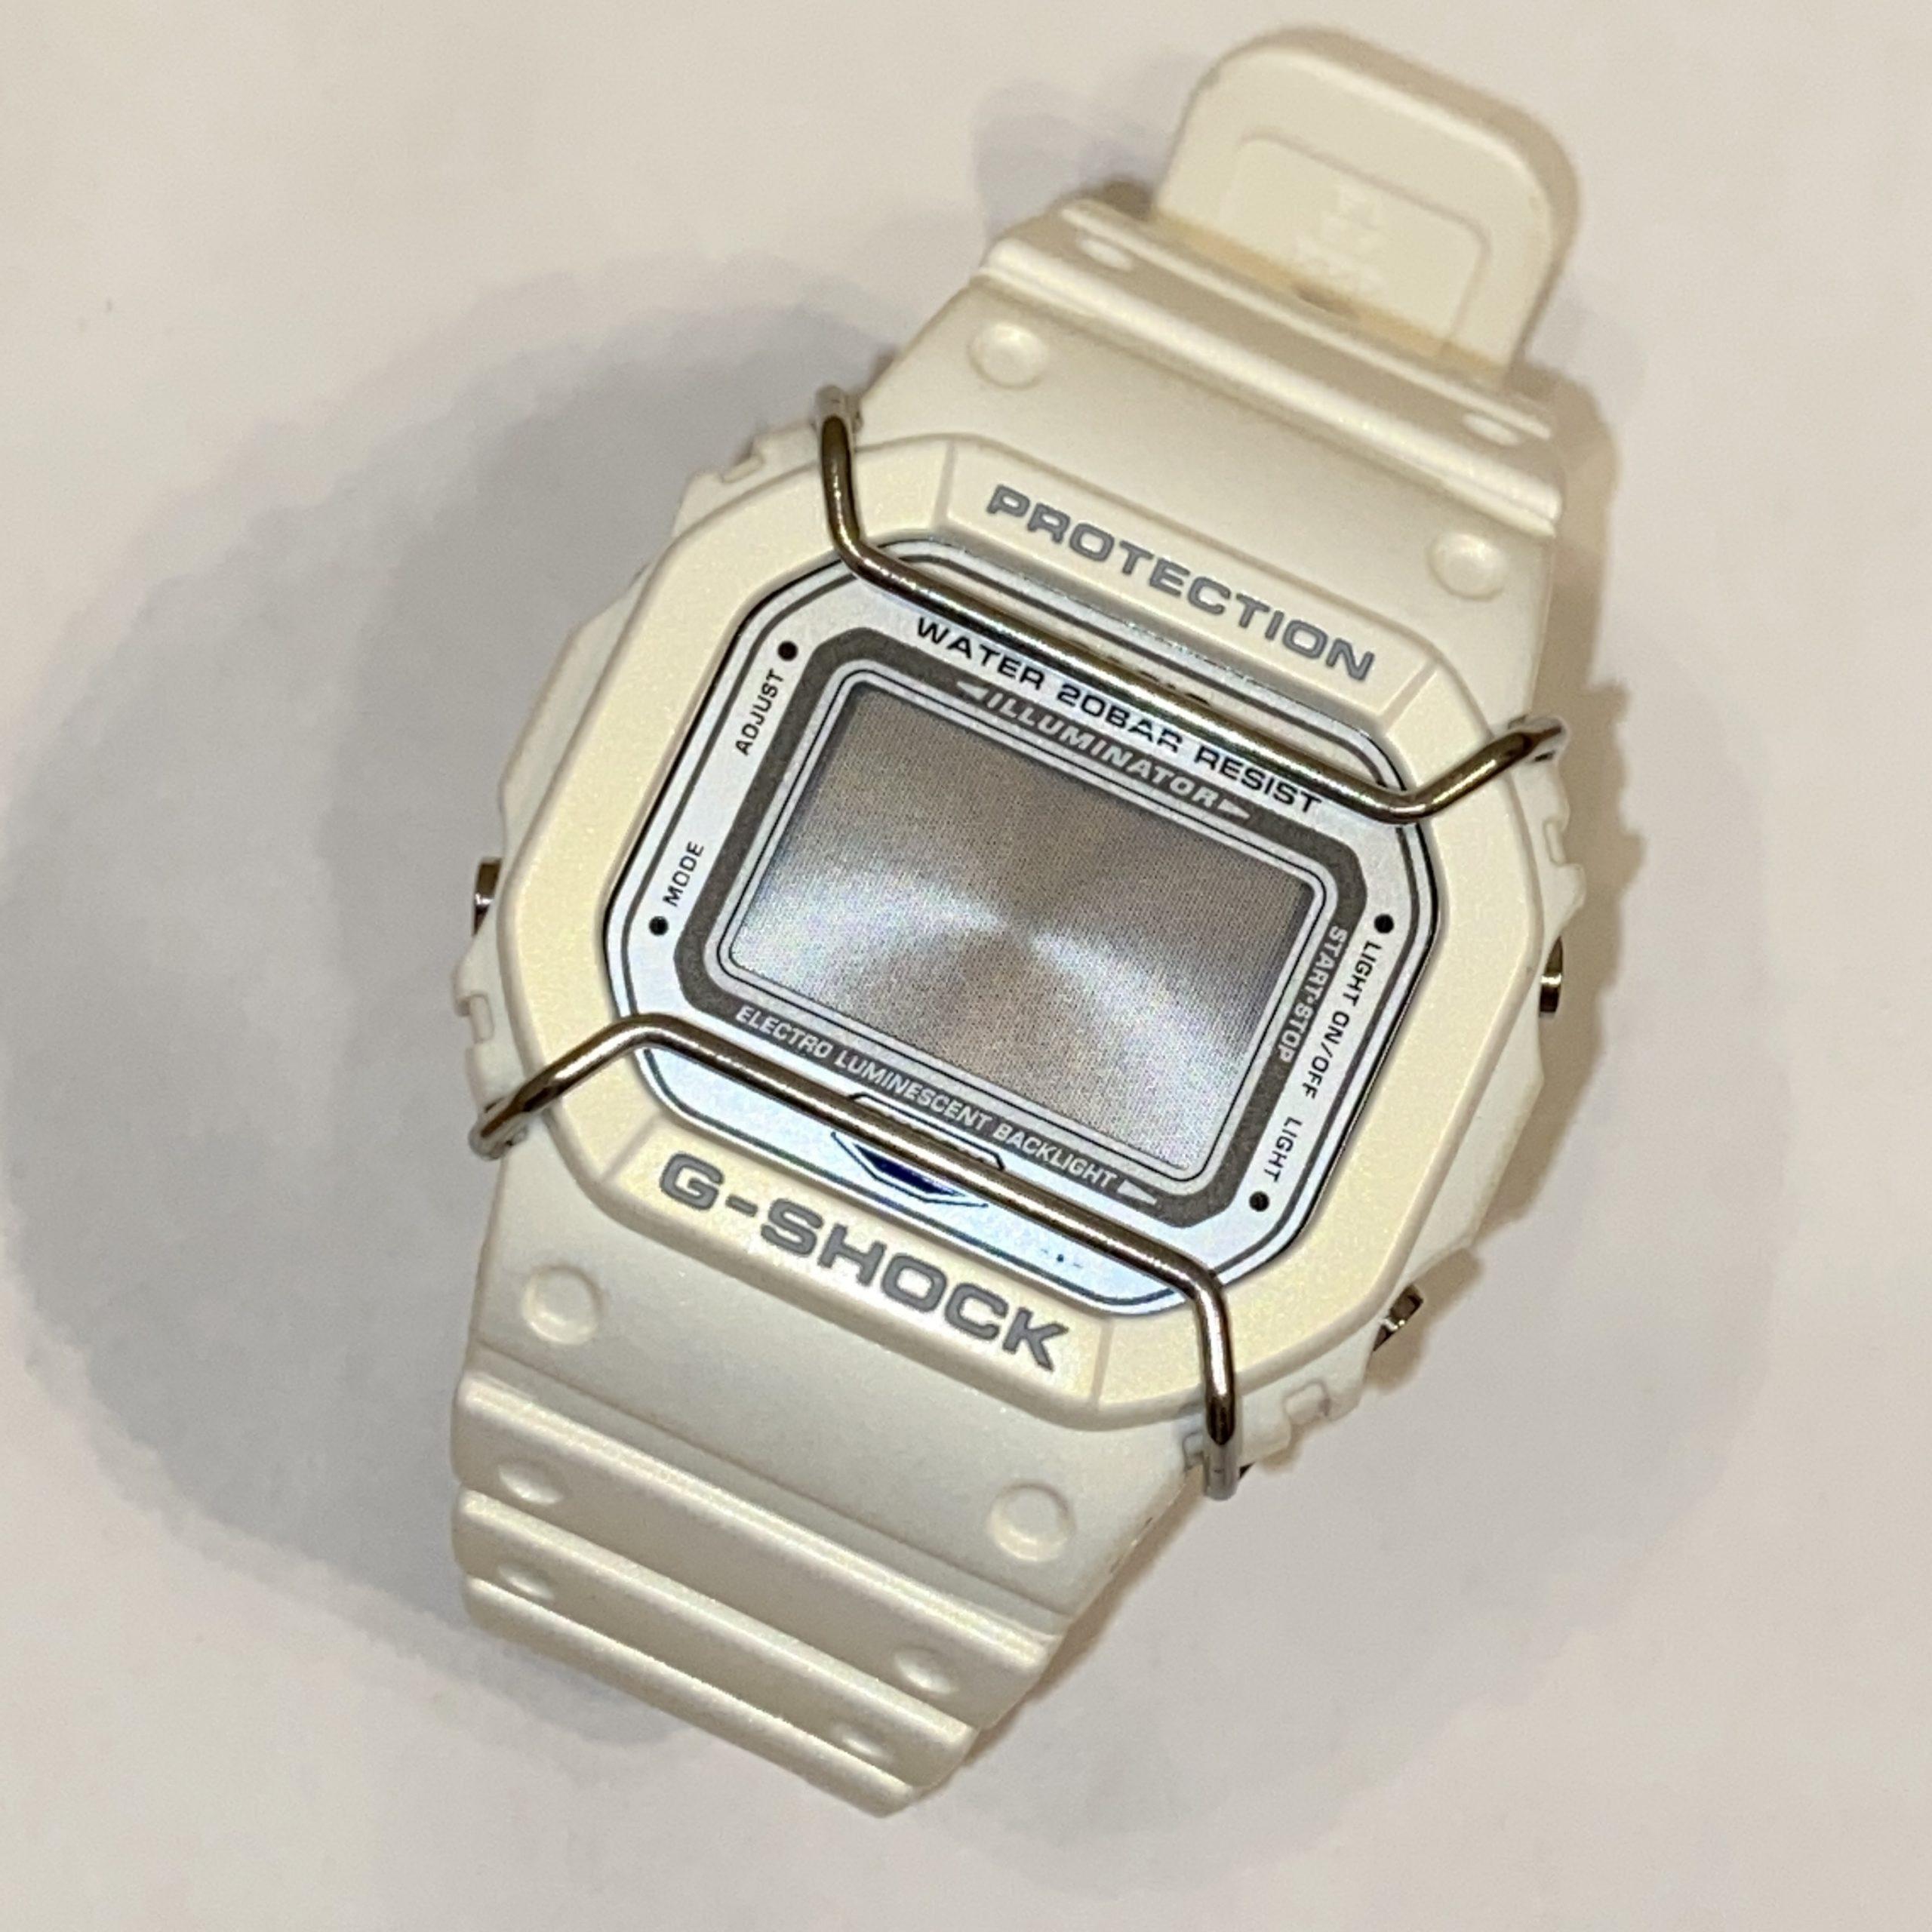 【CASIO/カシオ】G-SHOCK/ジーショック ラバーズコレクション2001 DW-5000LV